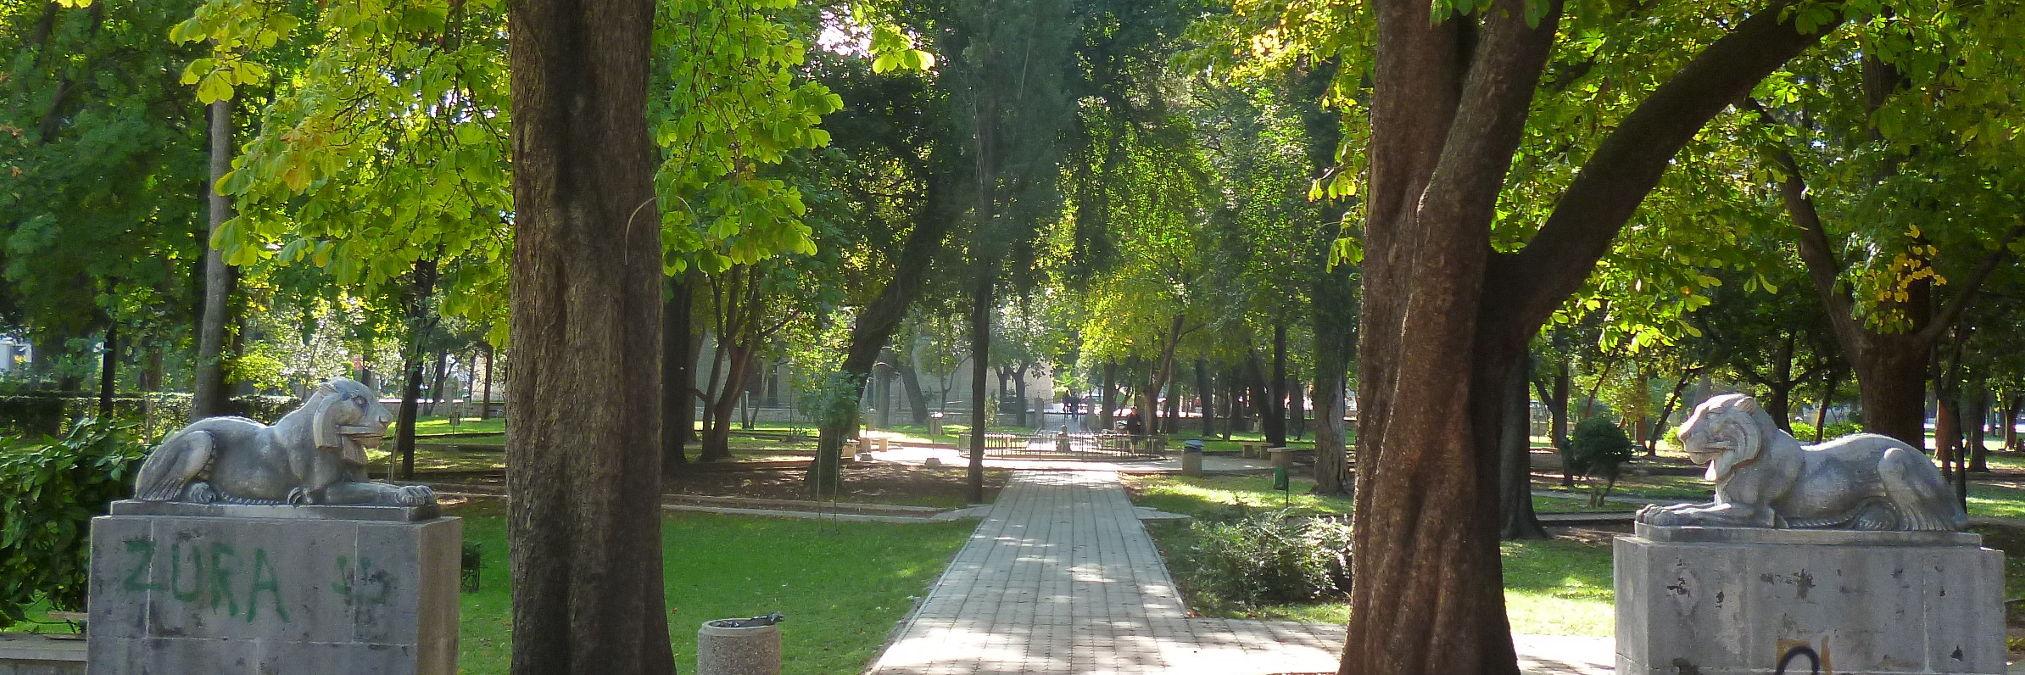 Парк Йована Дучича